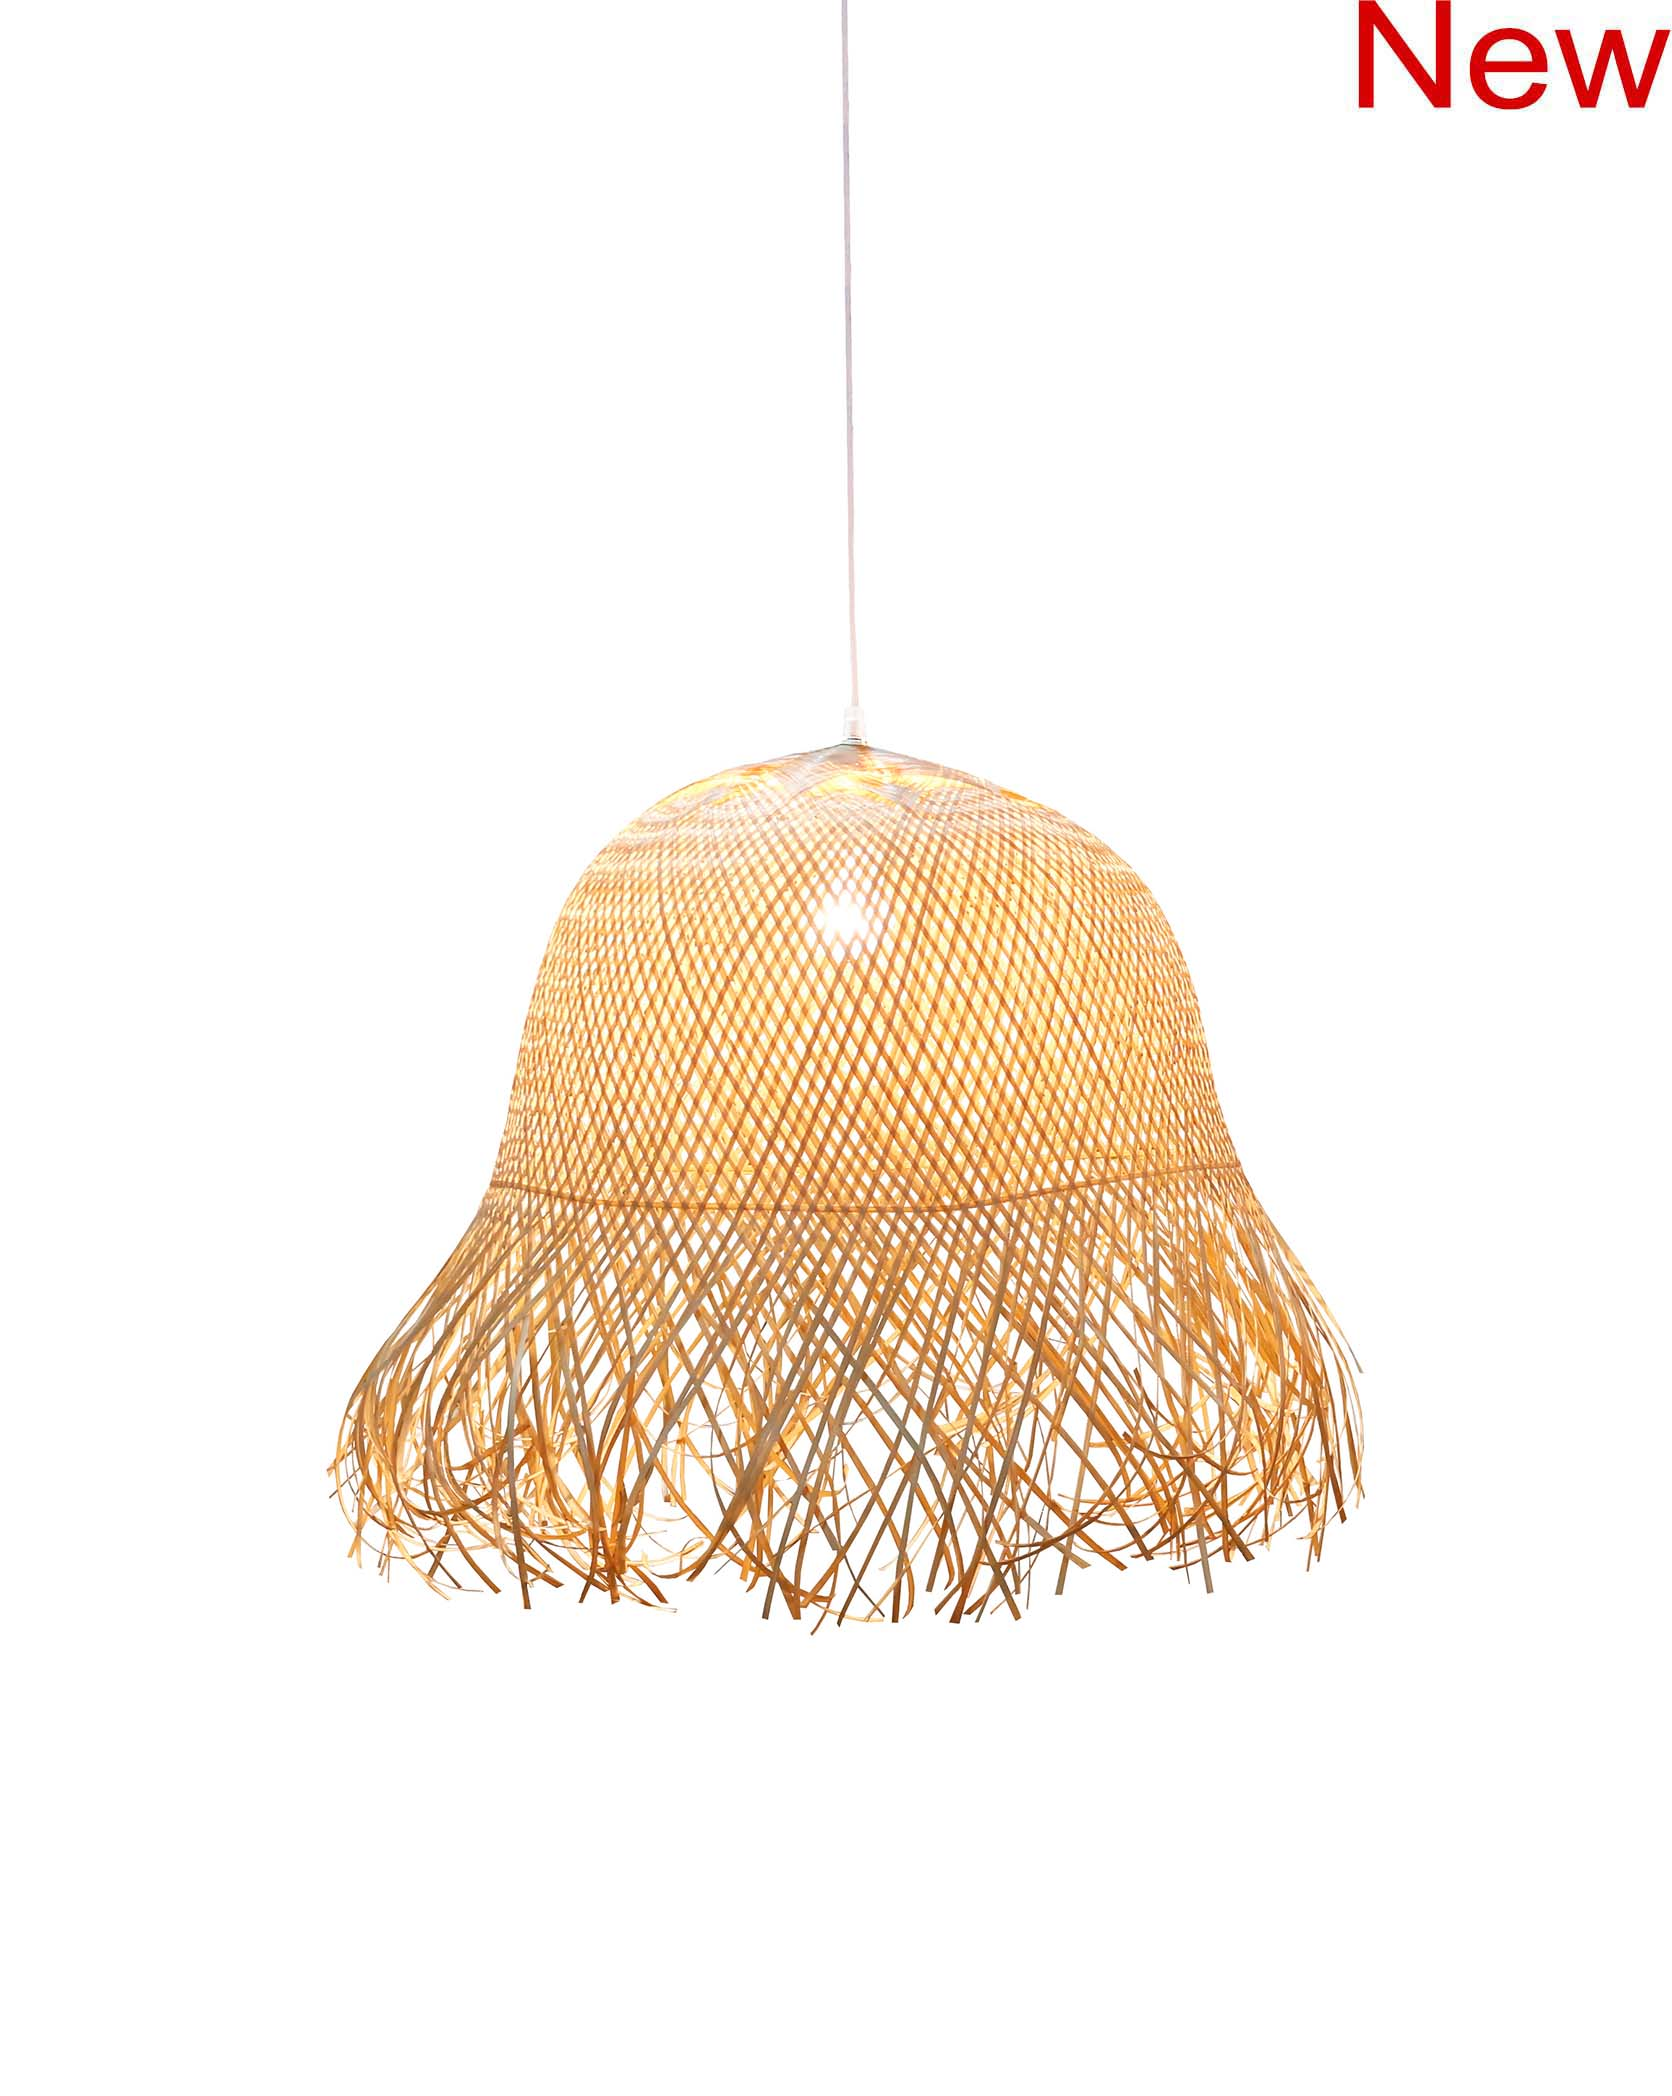 Bamboo Gem  pendant product photo #1